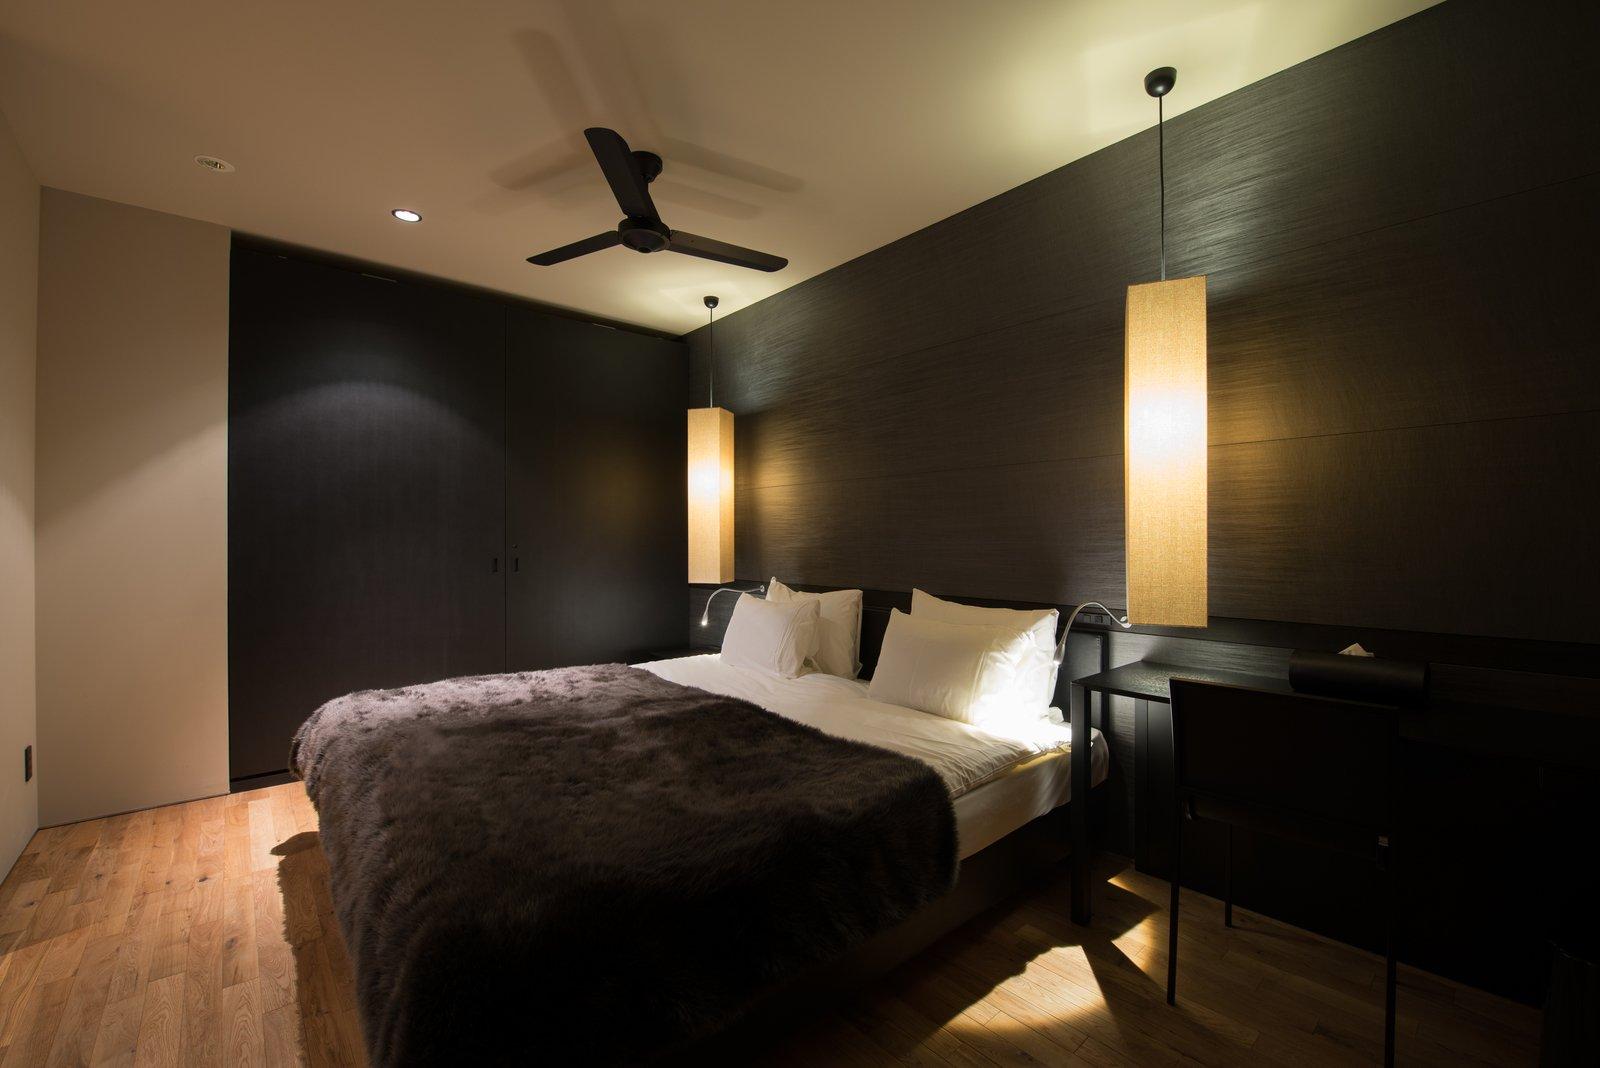 Muse niseko 201 2 bedroom apartment large